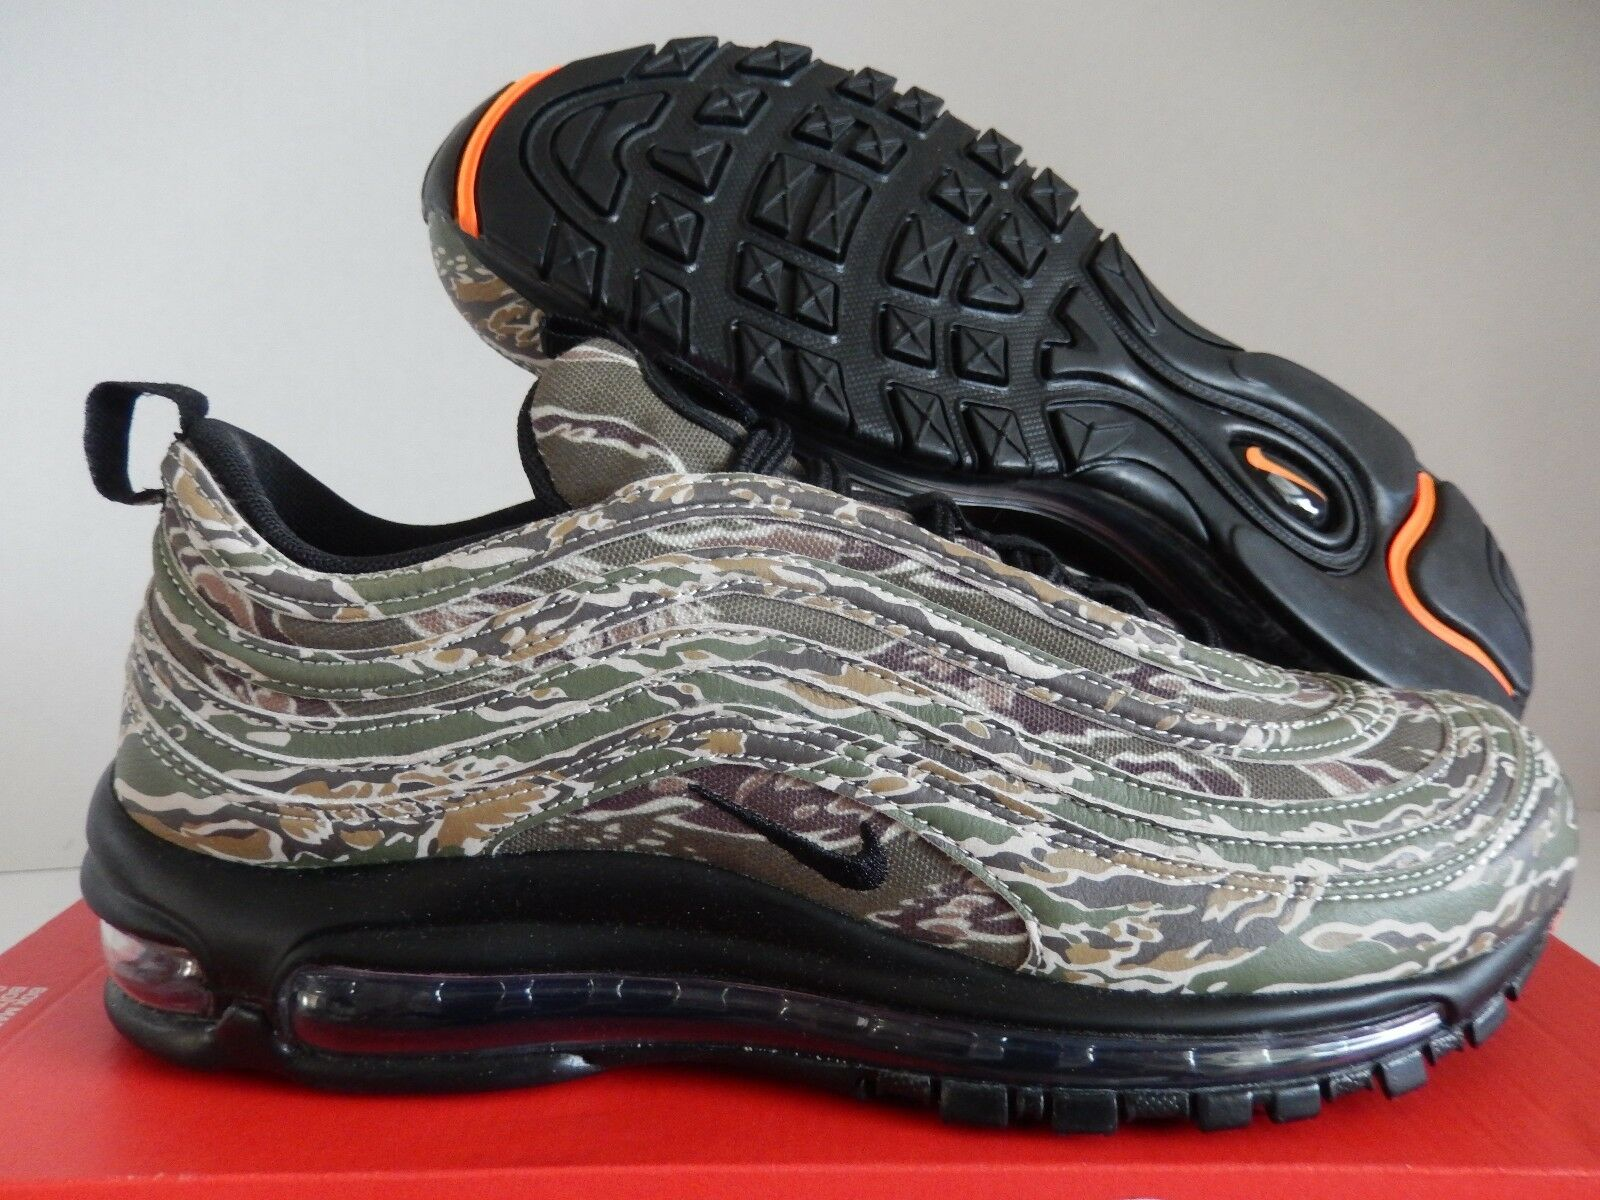 Nike air max 97 premio qs usa mimetico medio olive-nero sz 8 [aj2614-205]